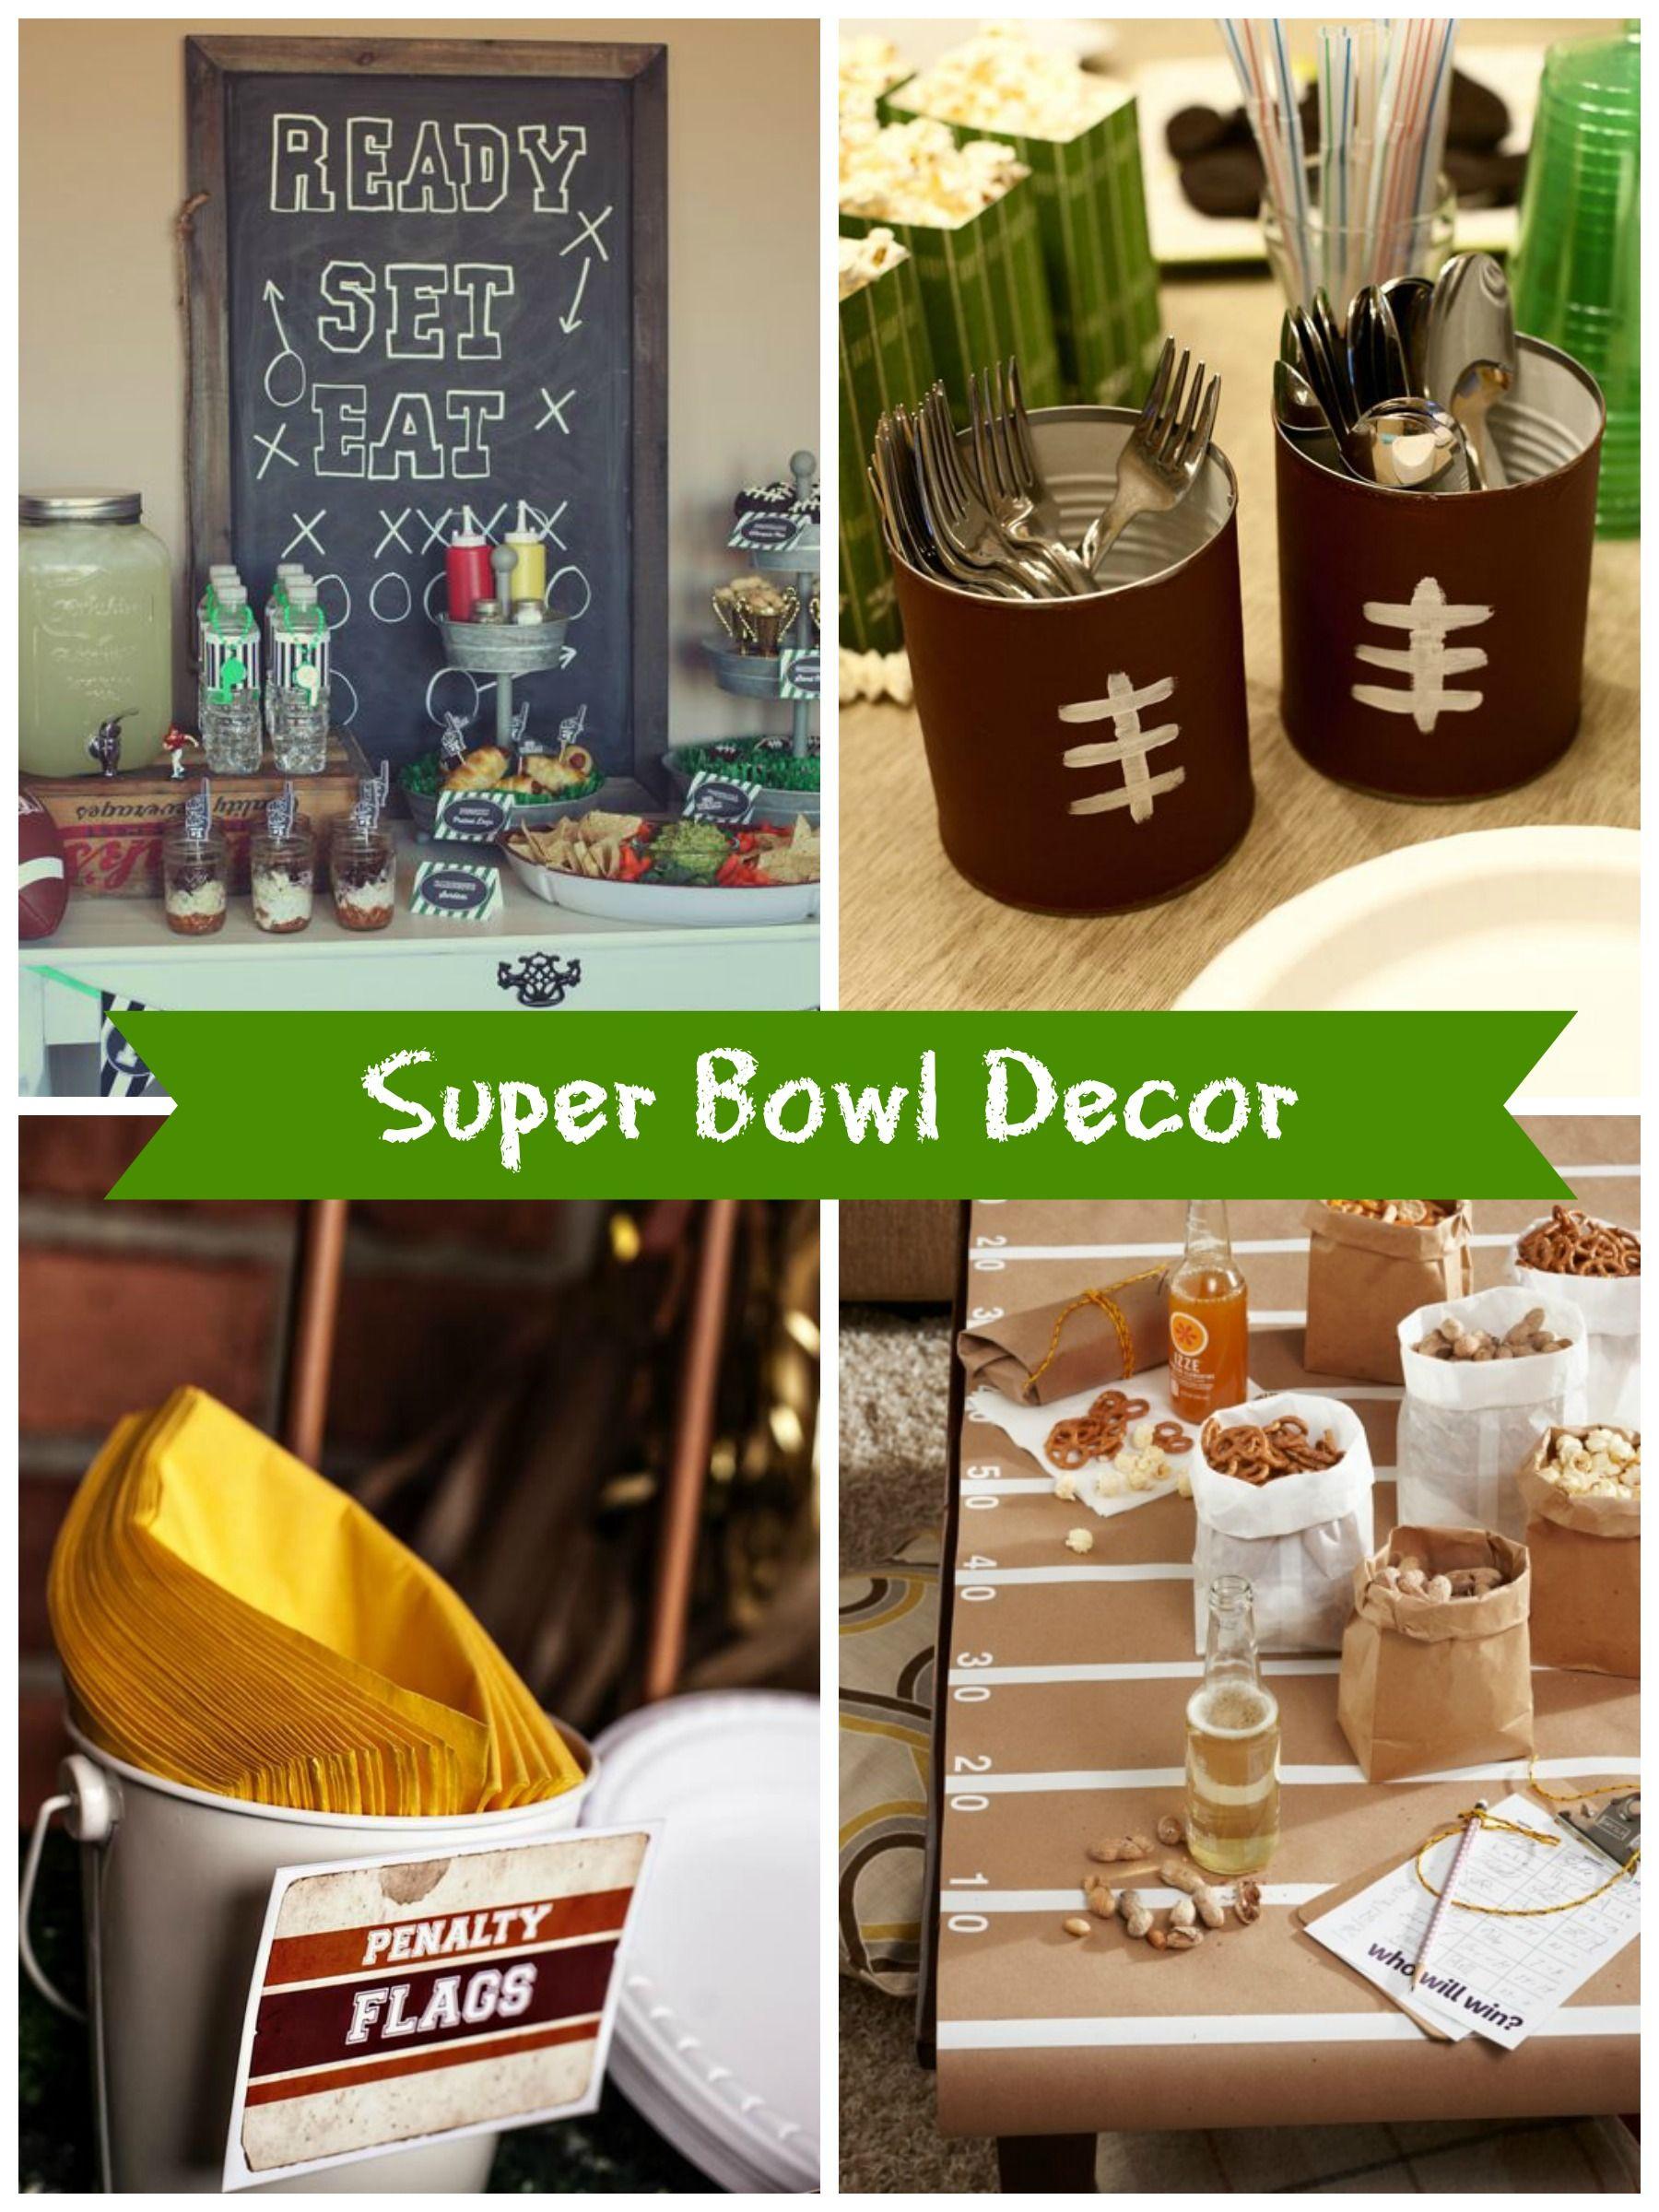 Bowl Decorating Ideas Super Bowl Sunday Diy Party Ideas  Diy Ideas  Pinterest  Diy